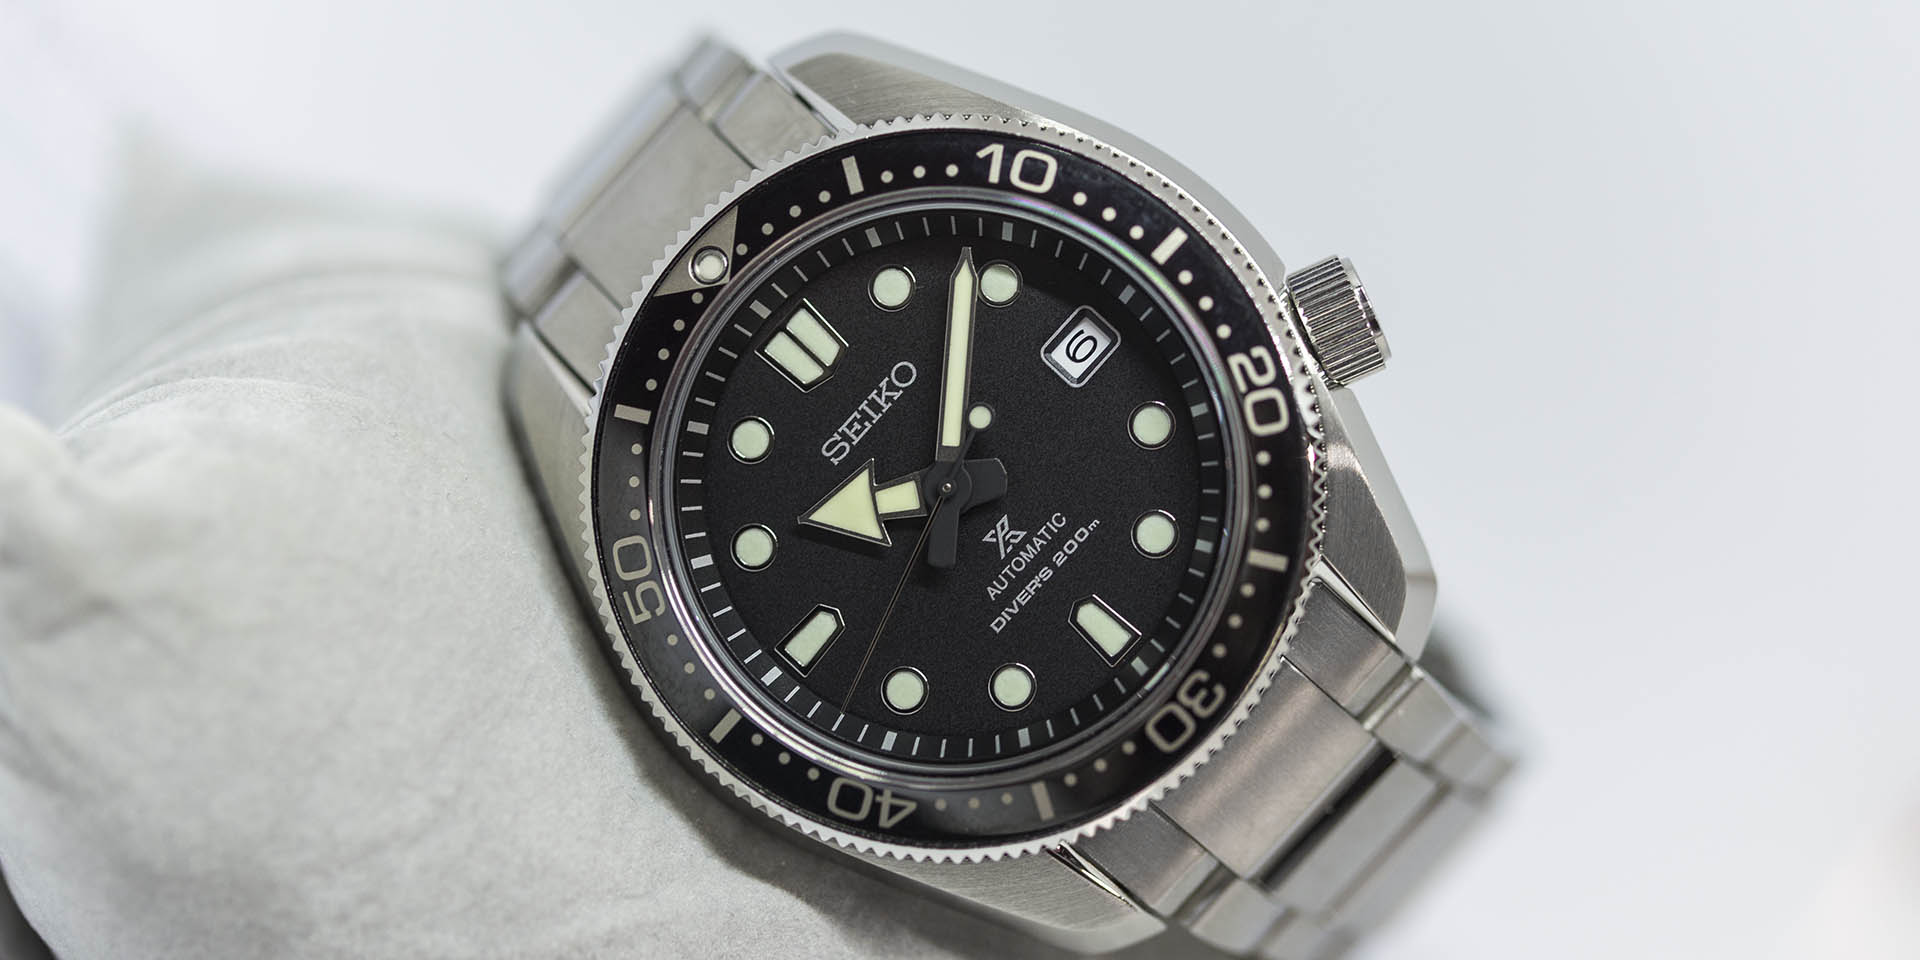 Spb077 diver 200m prospex seiko baselworld 2018 review horobox - Seiko dive watch history ...